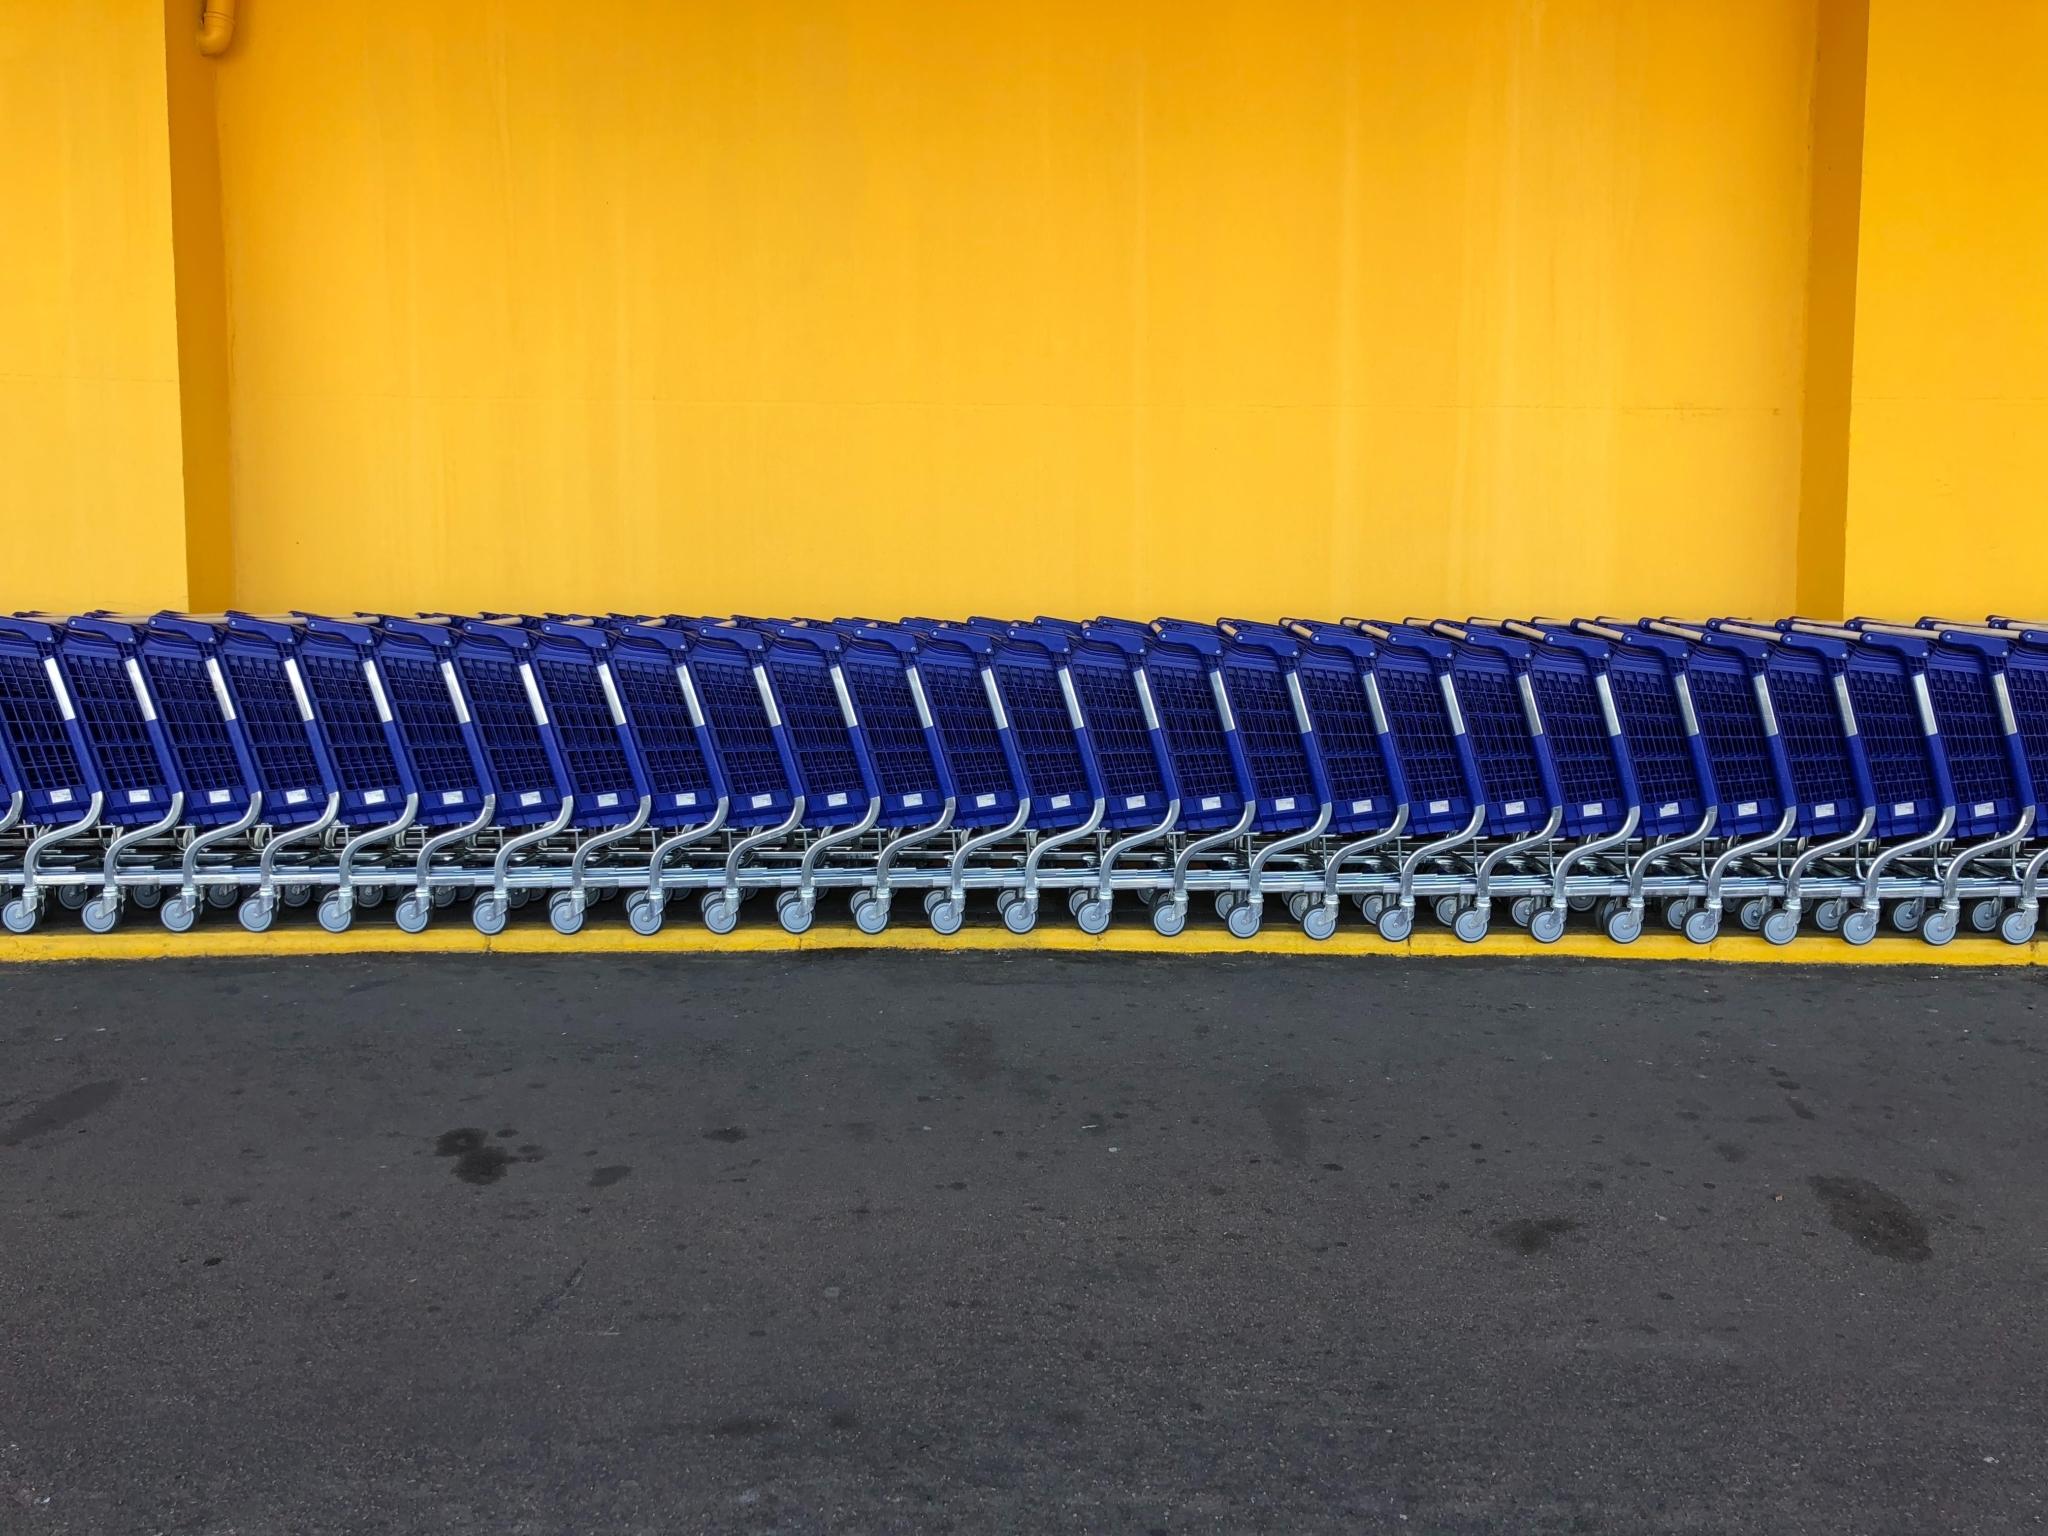 Retail shoppingcart fabio bracht unsplash